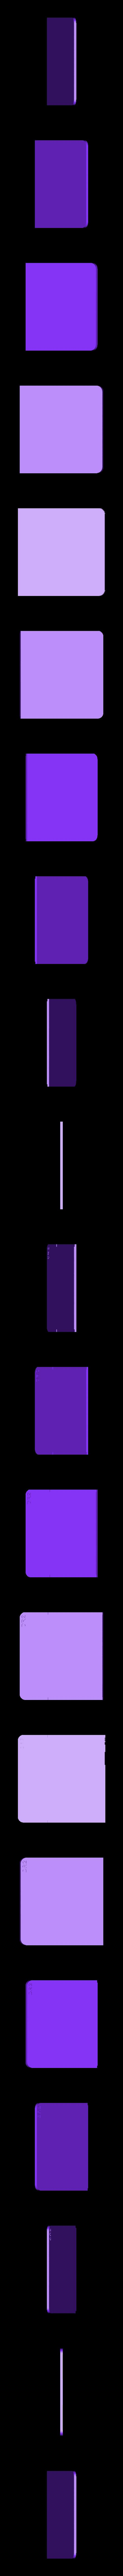 fond.stl Download STL file Module for mini drill and c is accessory N ° 2 • 3D printer model, prusai33